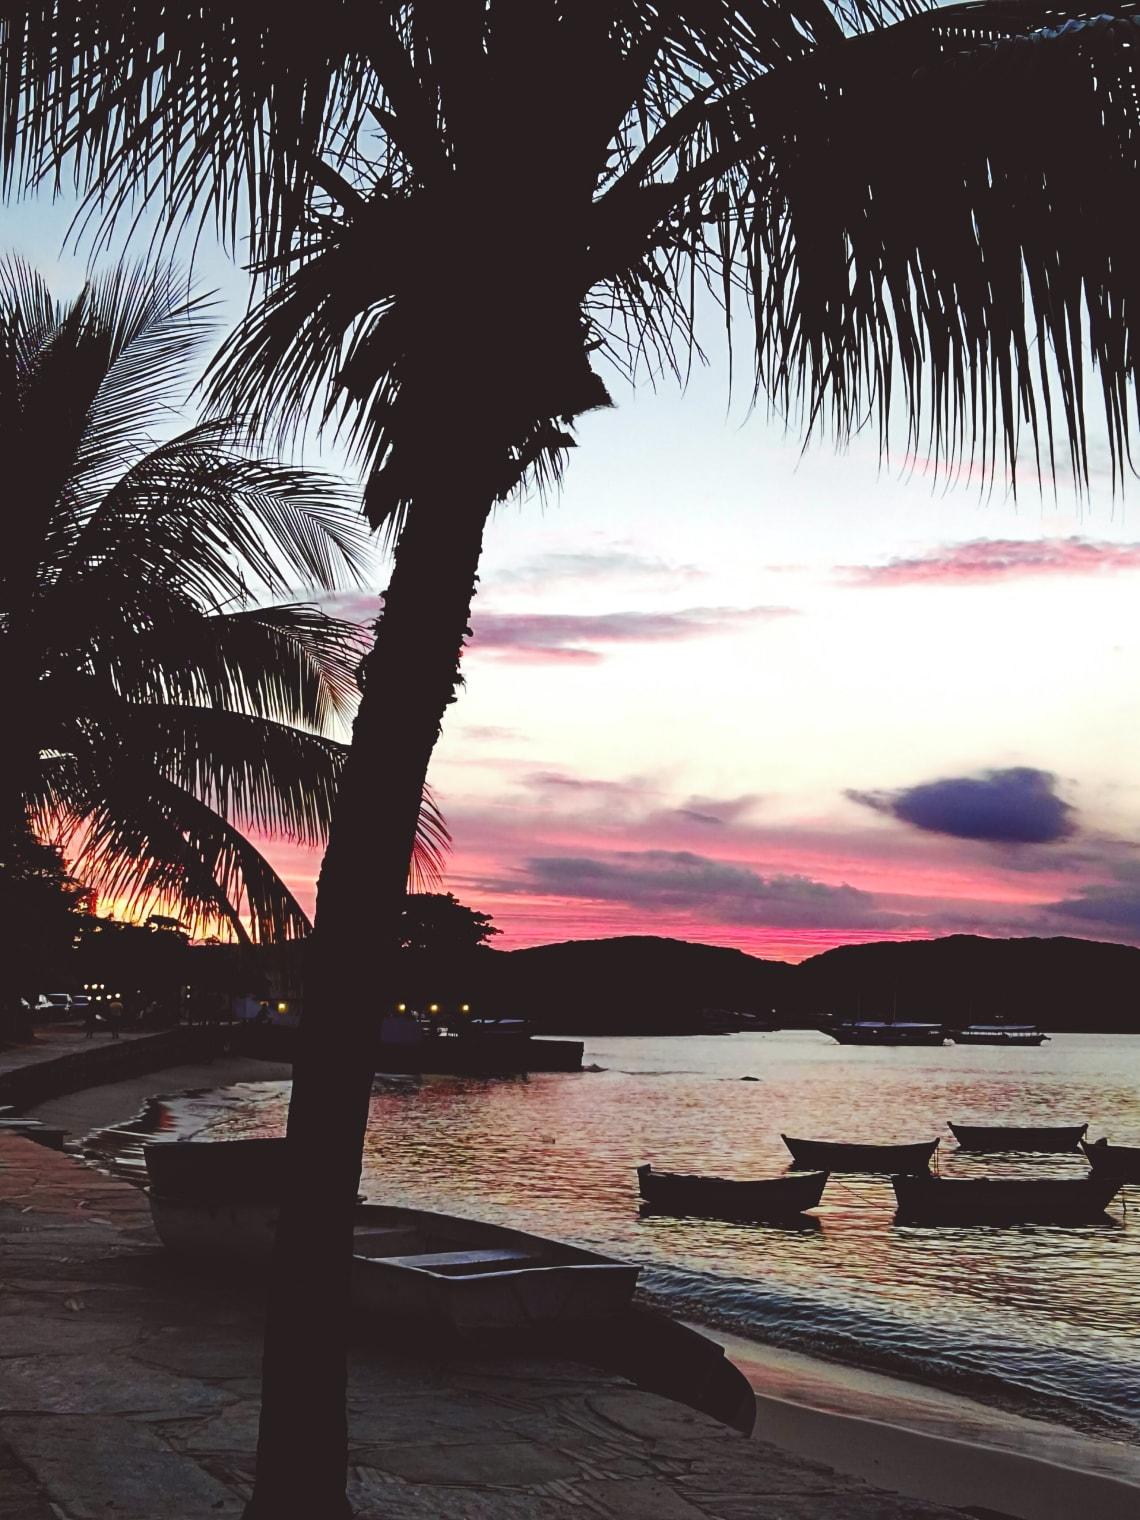 Cinco paraísos escondidos en Búzios que no te puedes perder - Brasil Búzios - Worldpackers